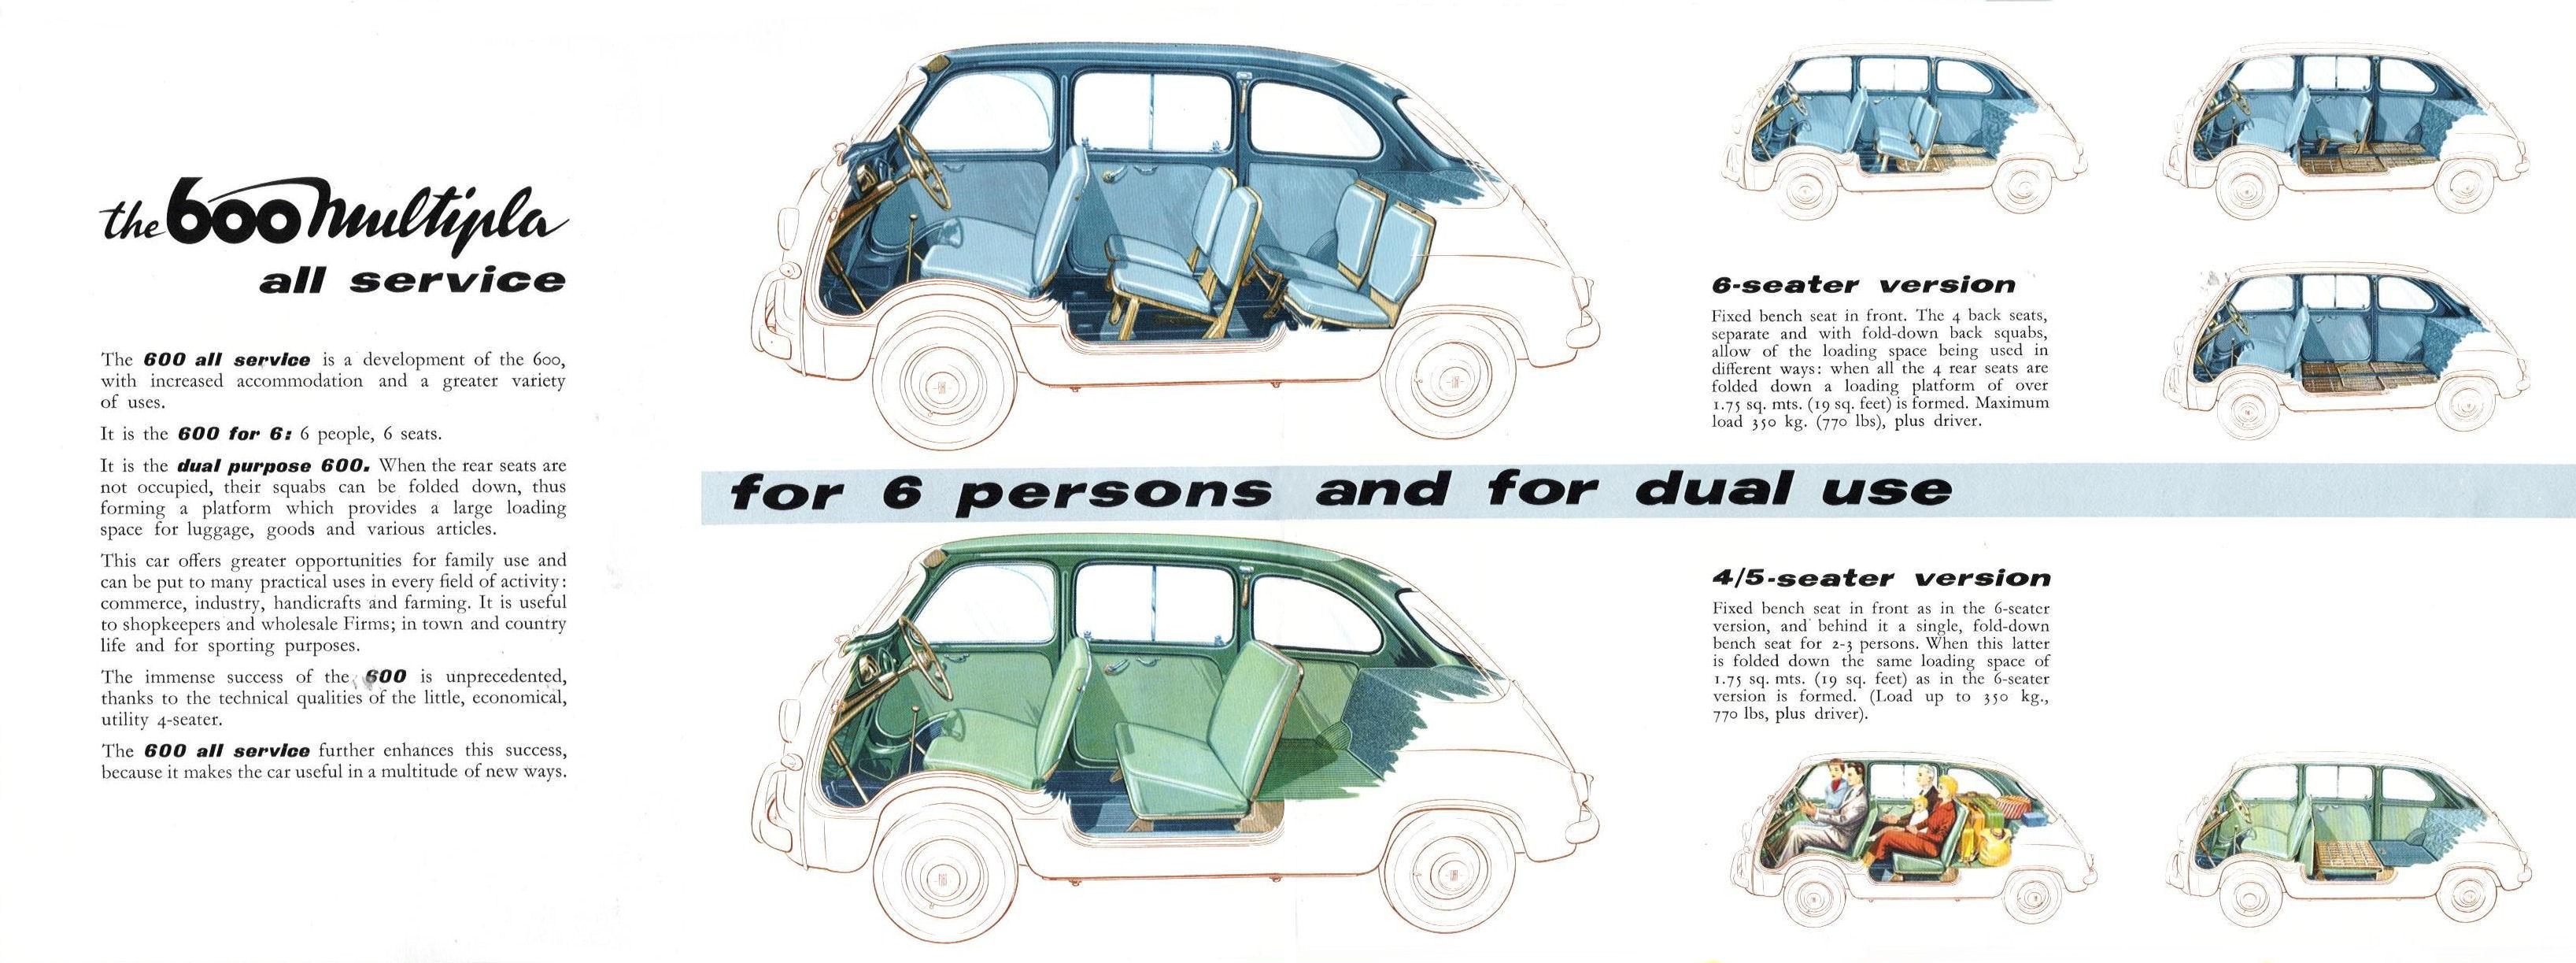 [IMG]http://s1.cdn.autoevolution.com/images/gallery/FIAT-600-Multipla-2342_18.jpg[/IMG]